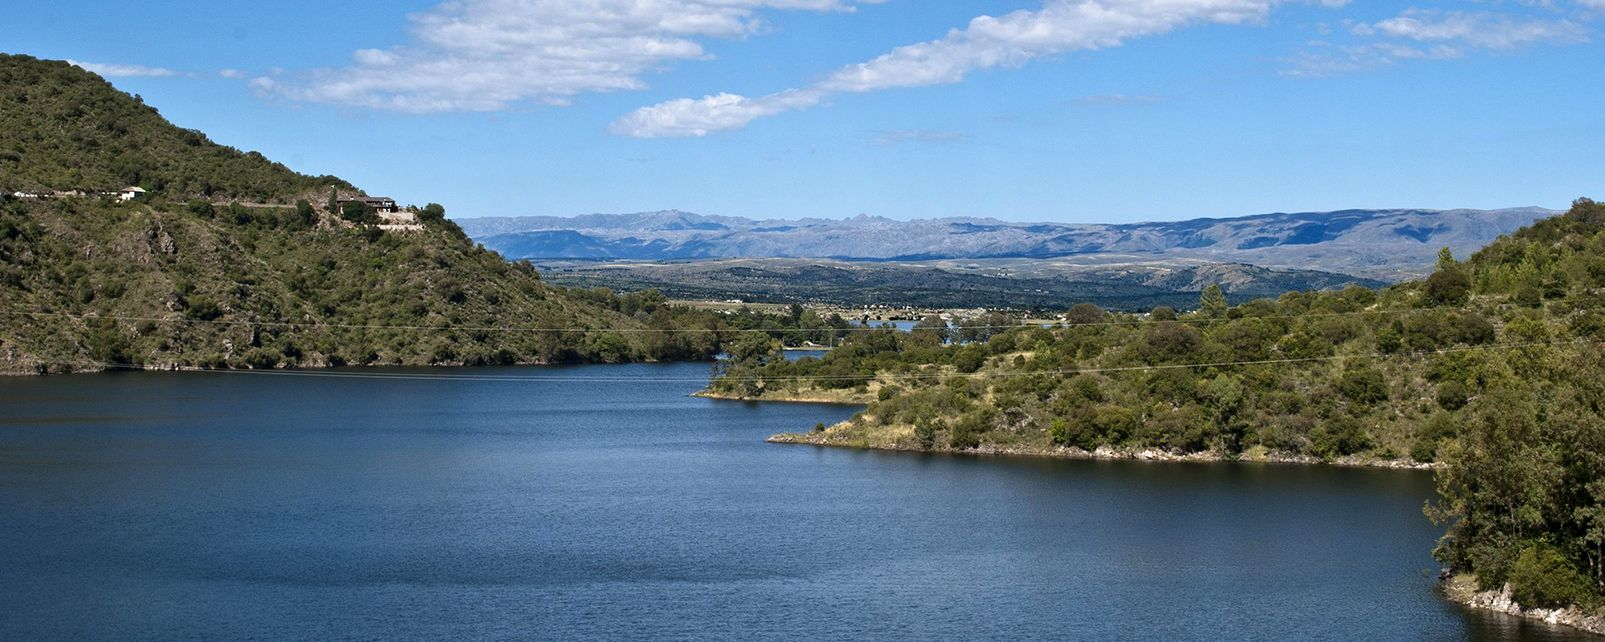 The Sierra de Córdoba , Argentina